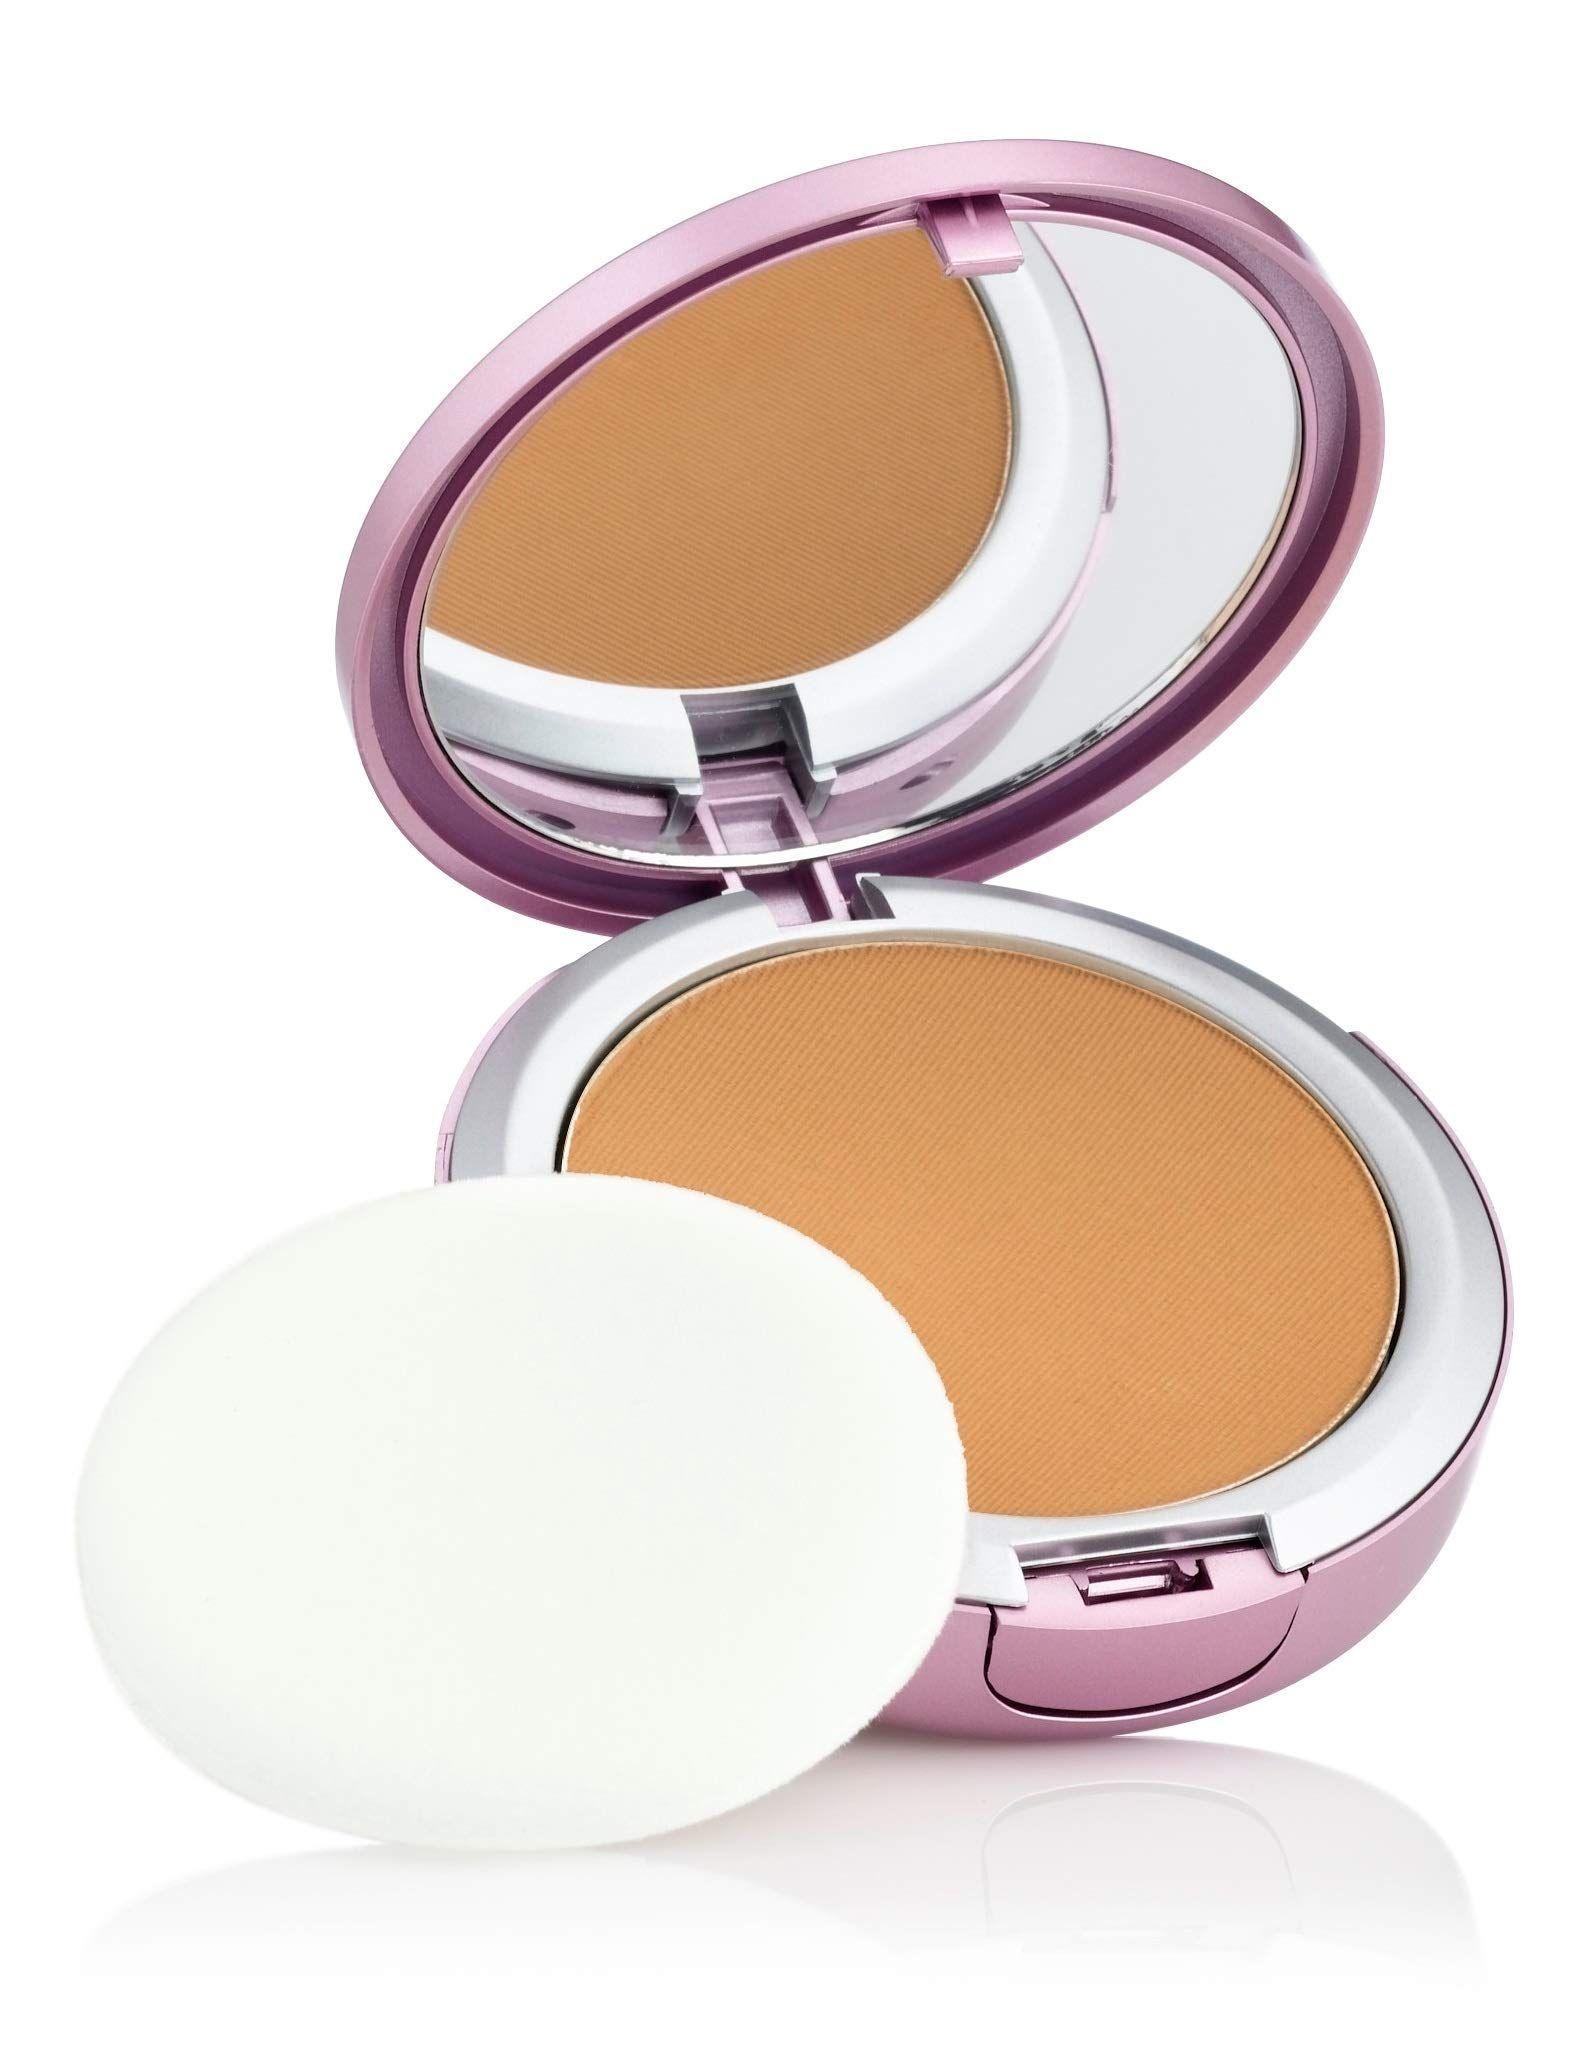 Mally Beauty – Poreless Perfection Foundation – Fresh